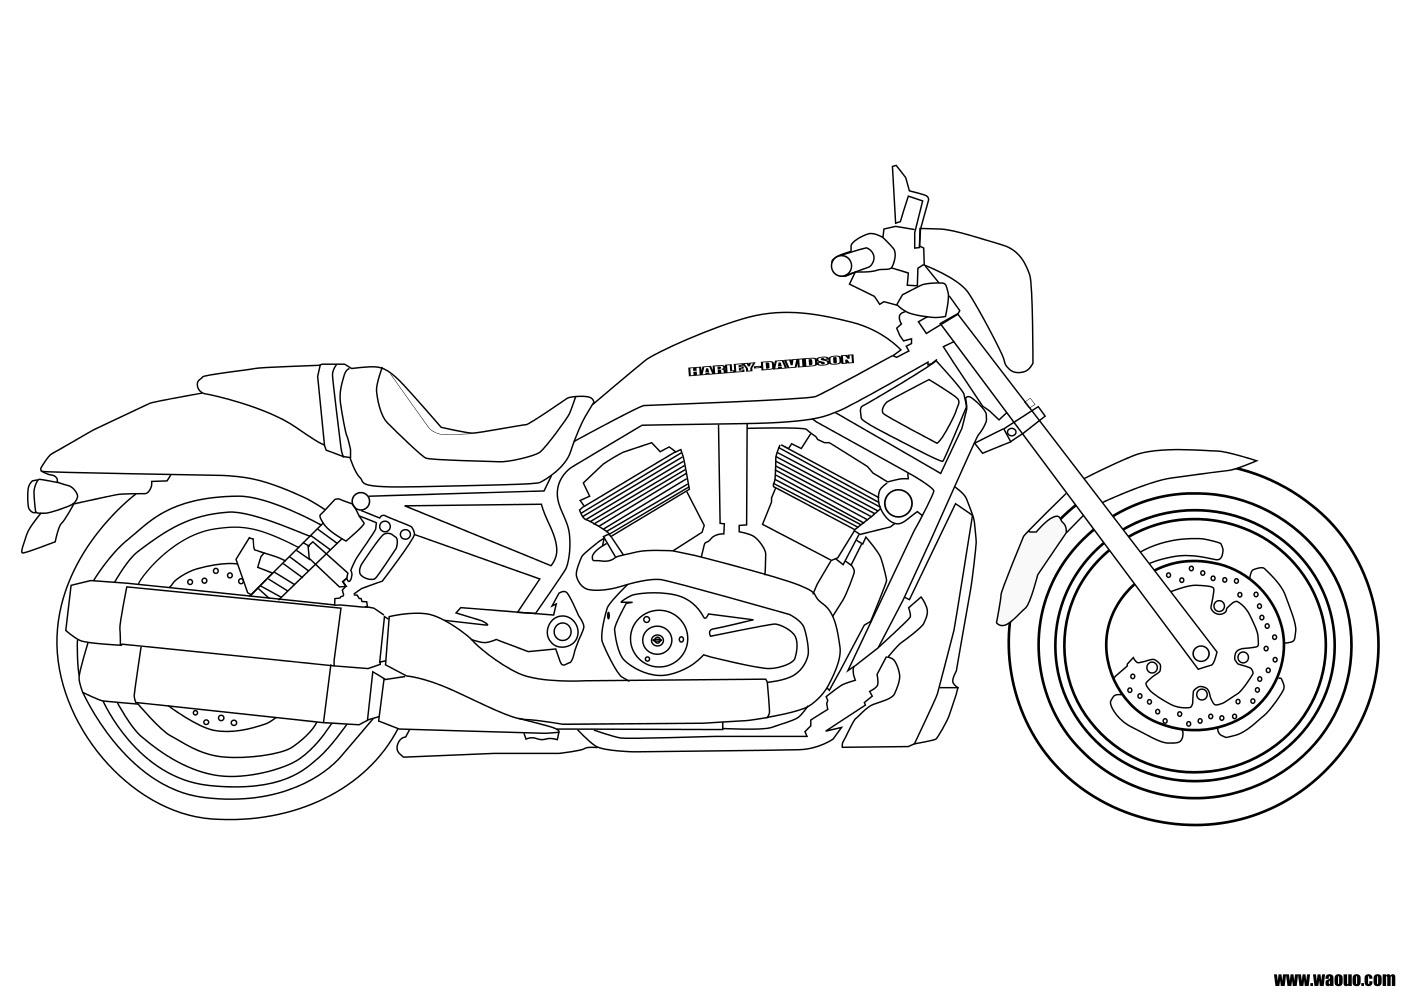 Coloriage moto Harley Davidson  imprimer et colorier